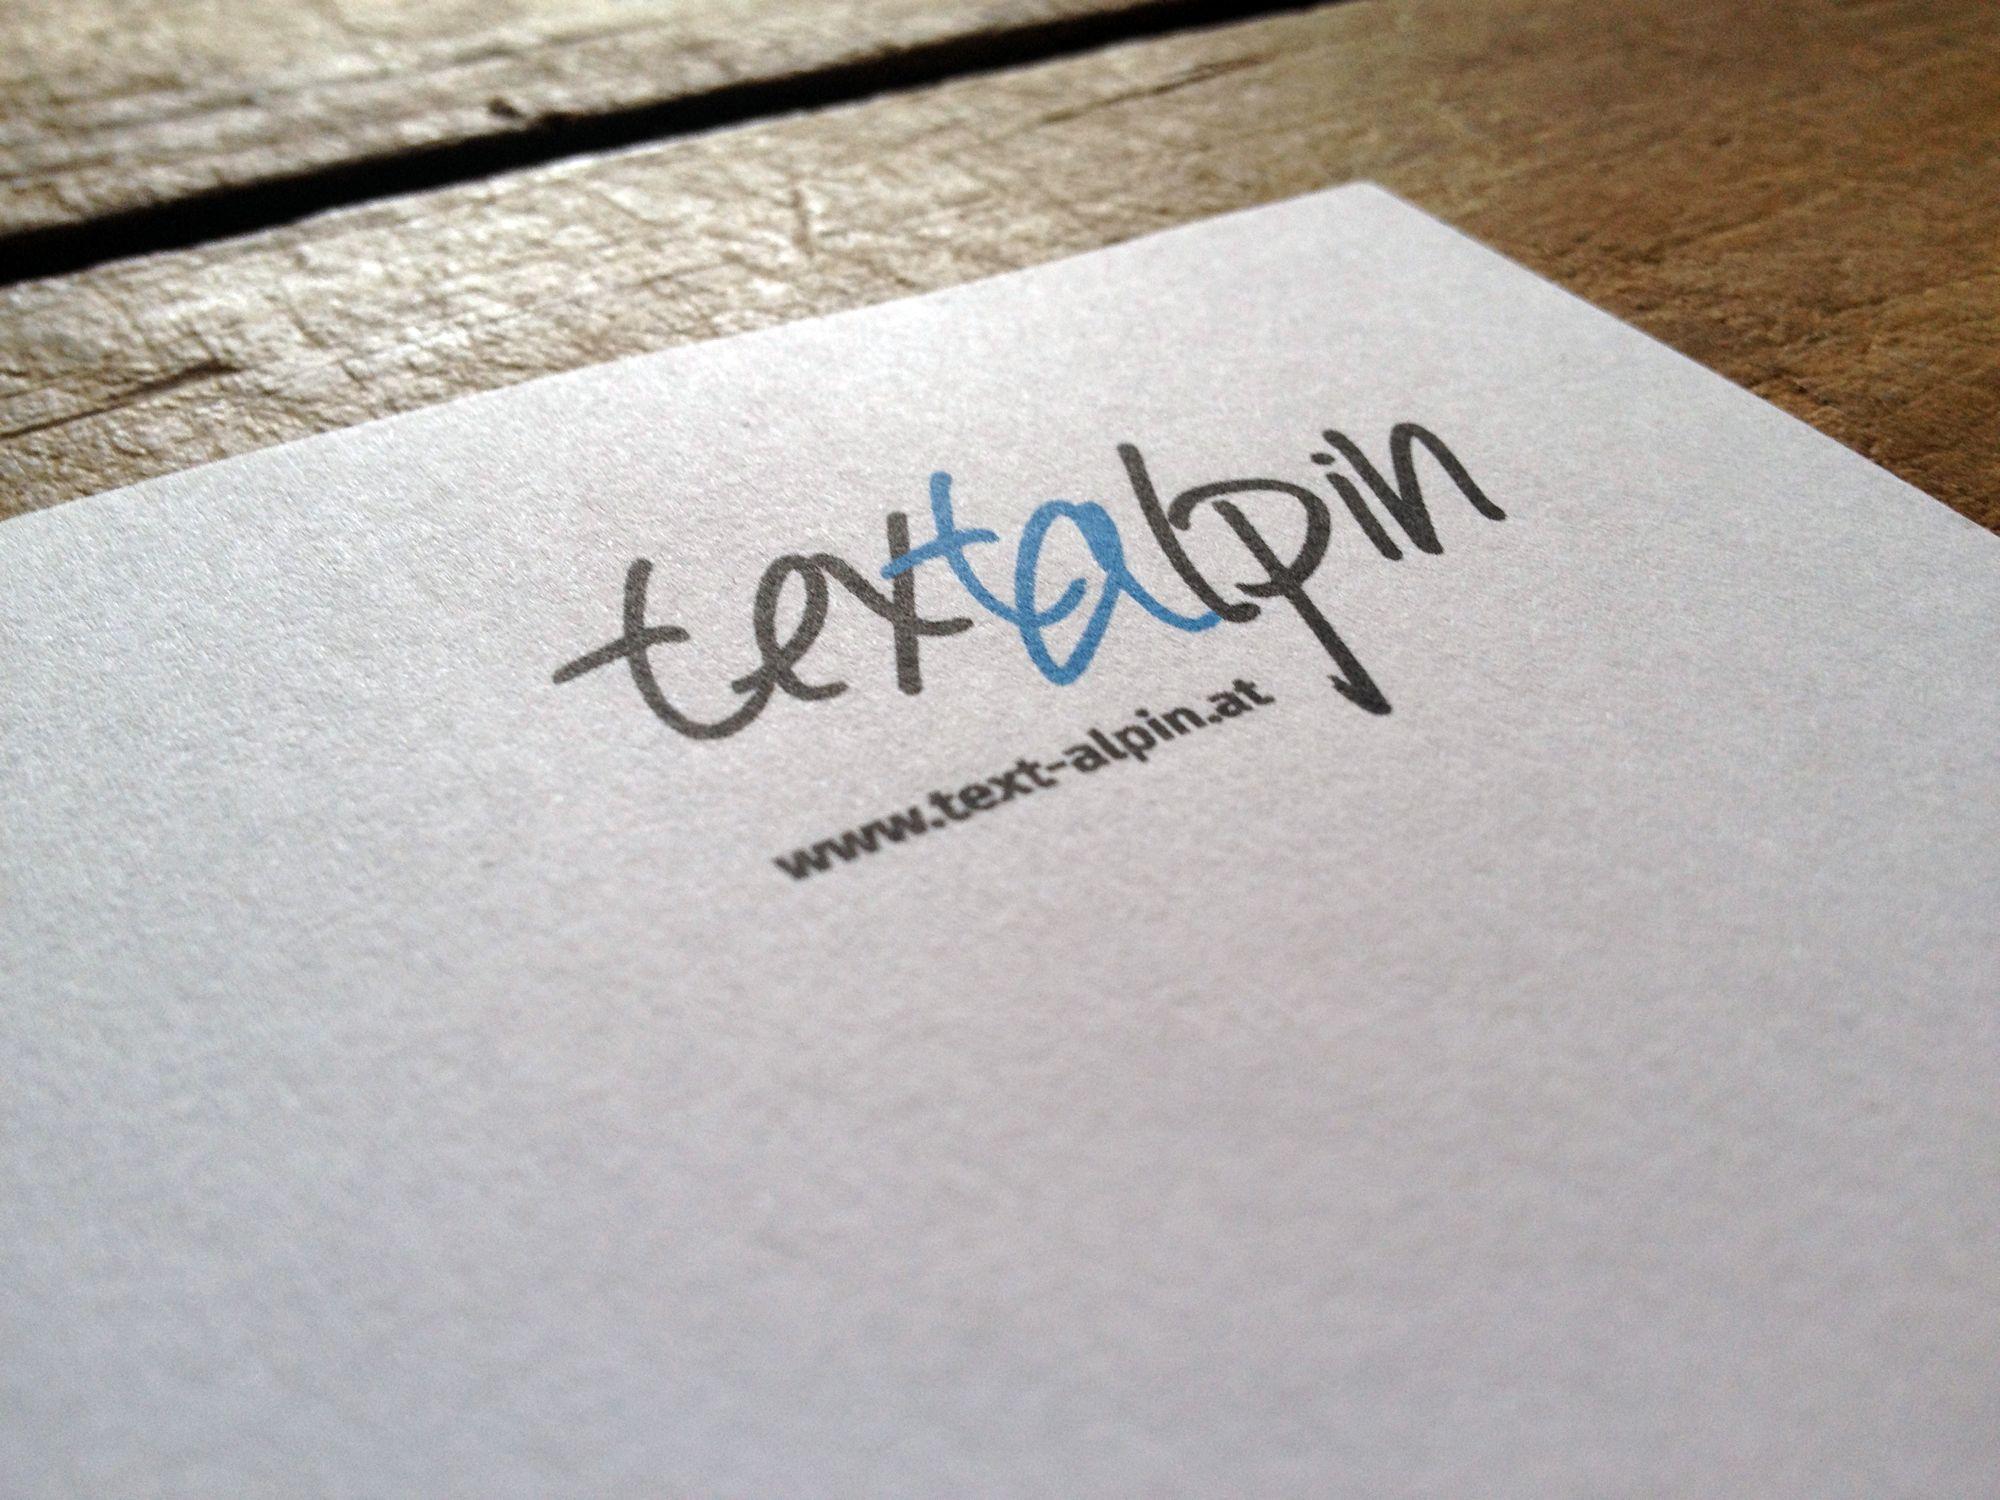 Geschäftsausstattung für text-alpin